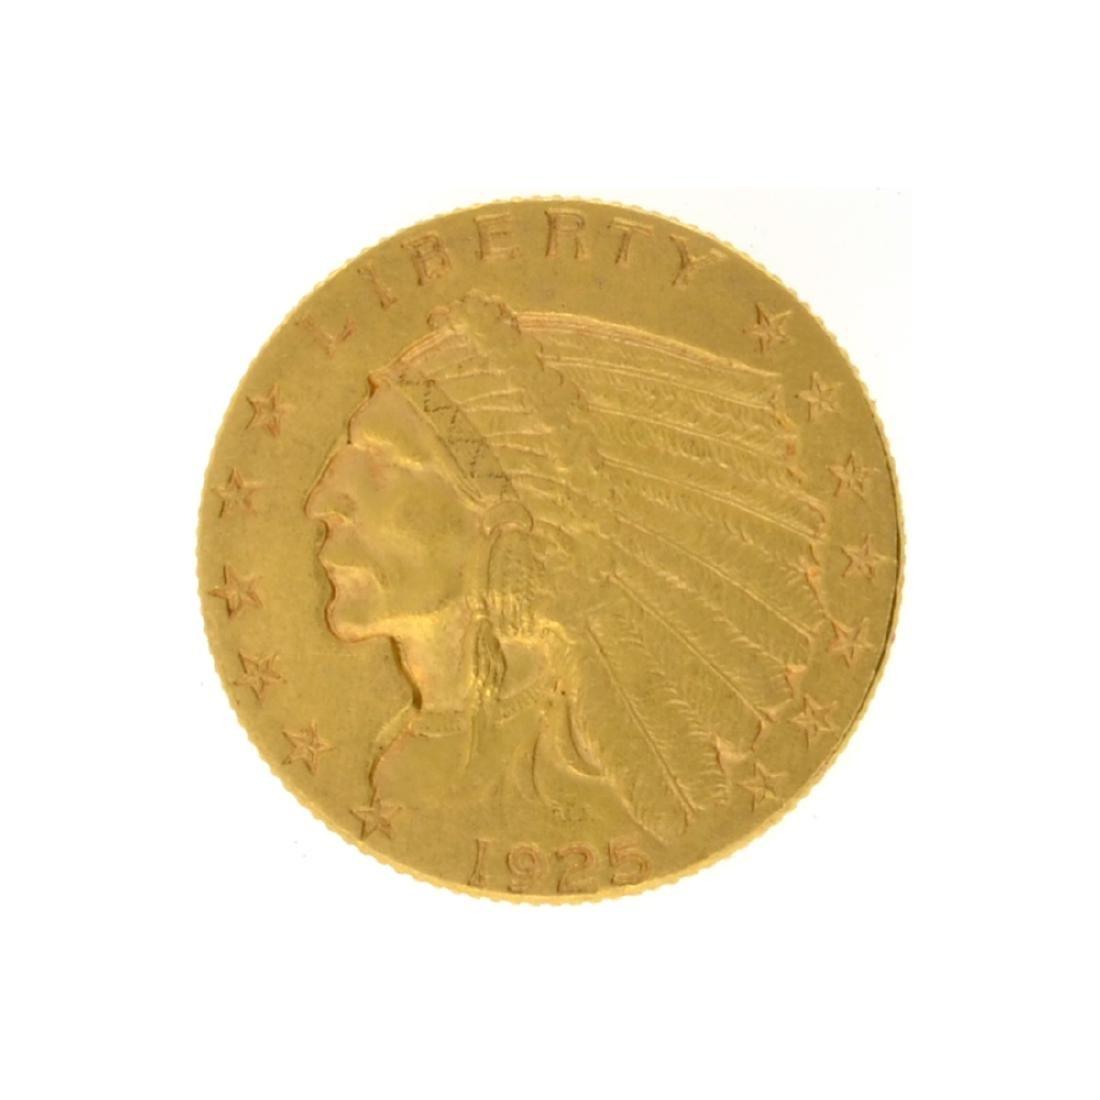 1925-D $2.50 Indian Head Gold Coin